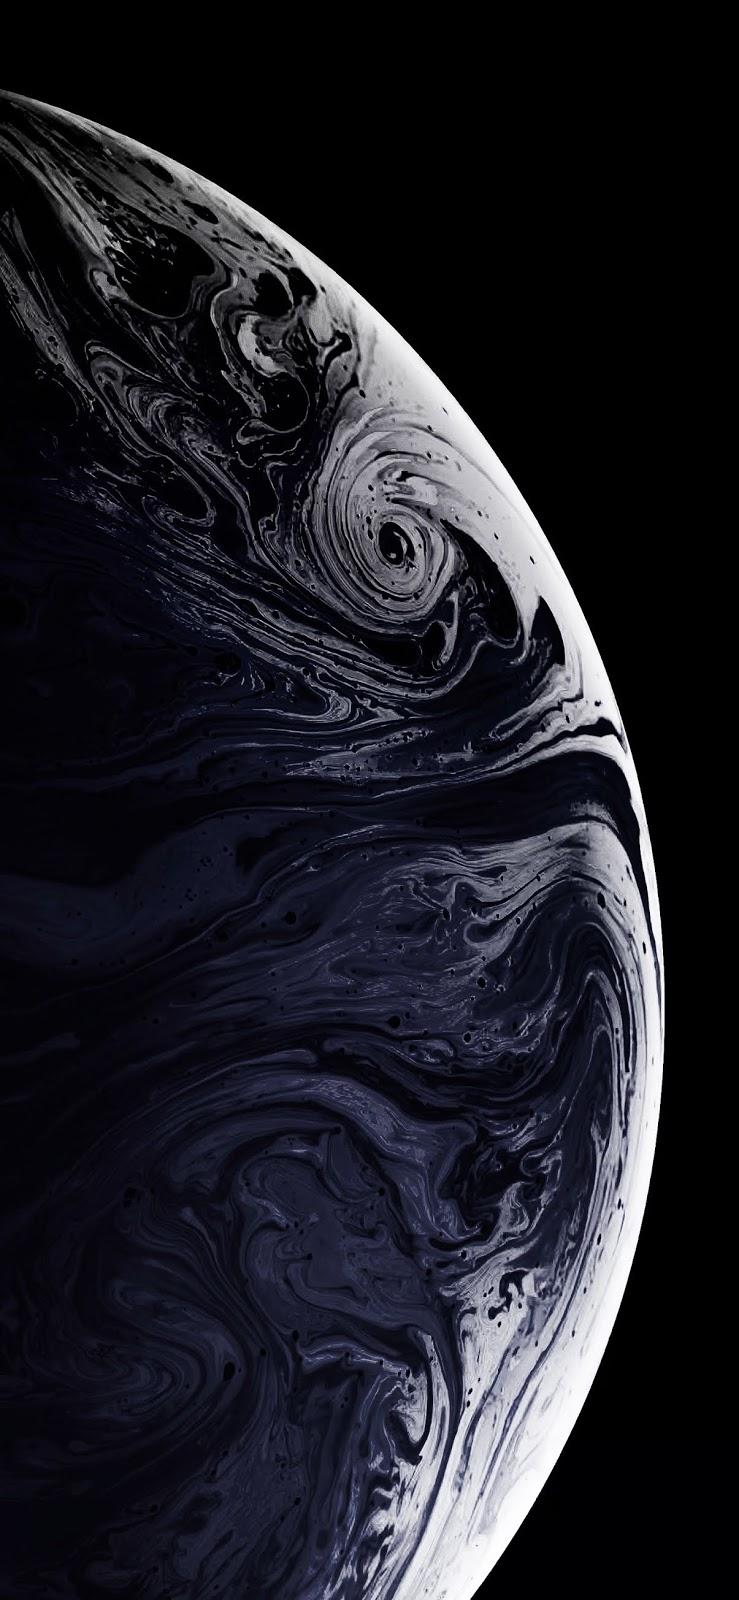 iPhoneXSMAX Modd (Space Grey) by AR72014